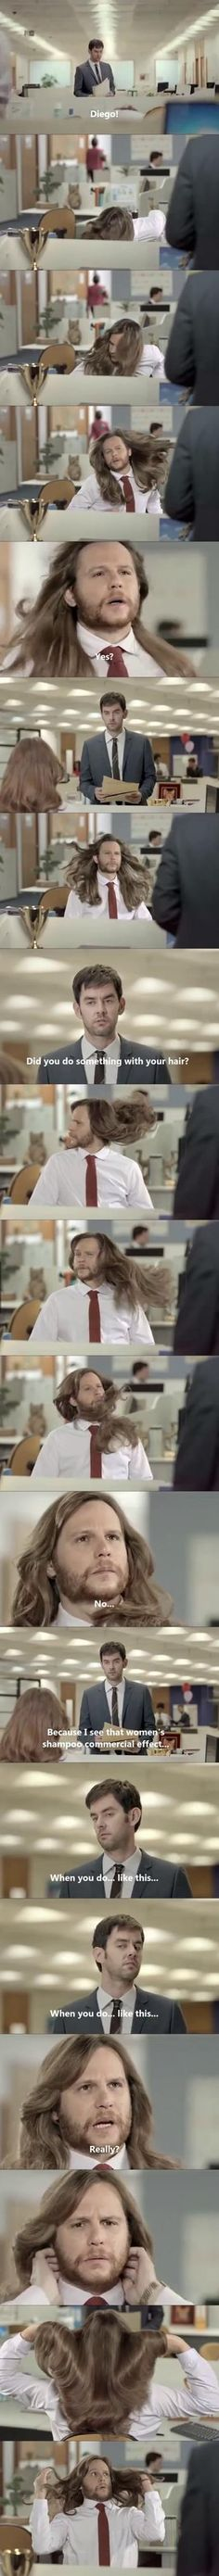 When men use women's shampoo. hahahah